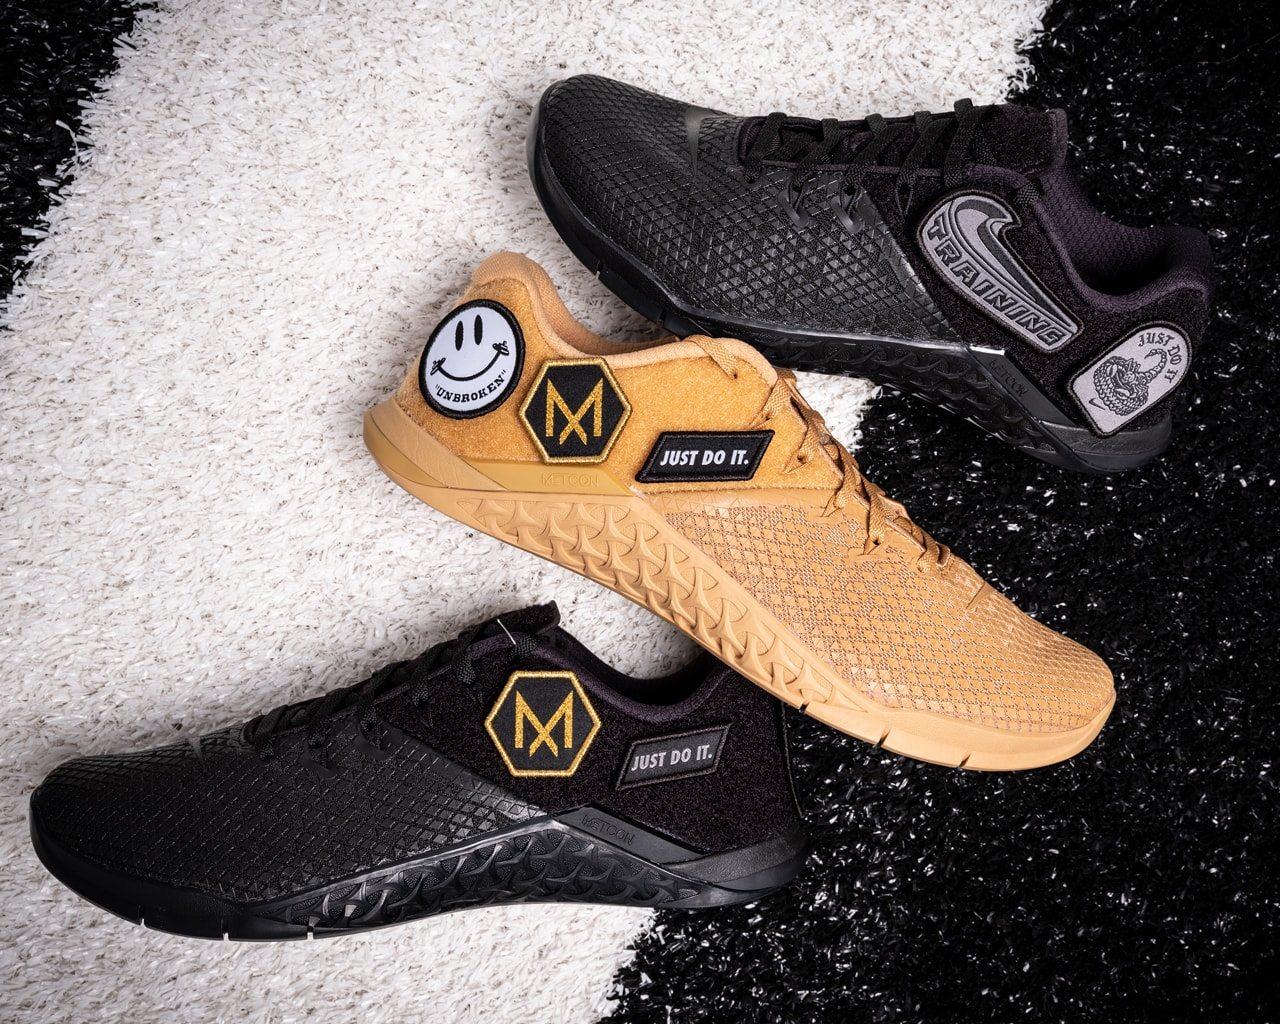 Nike Metcon XD versão exclusiva 🇺🇸 ent